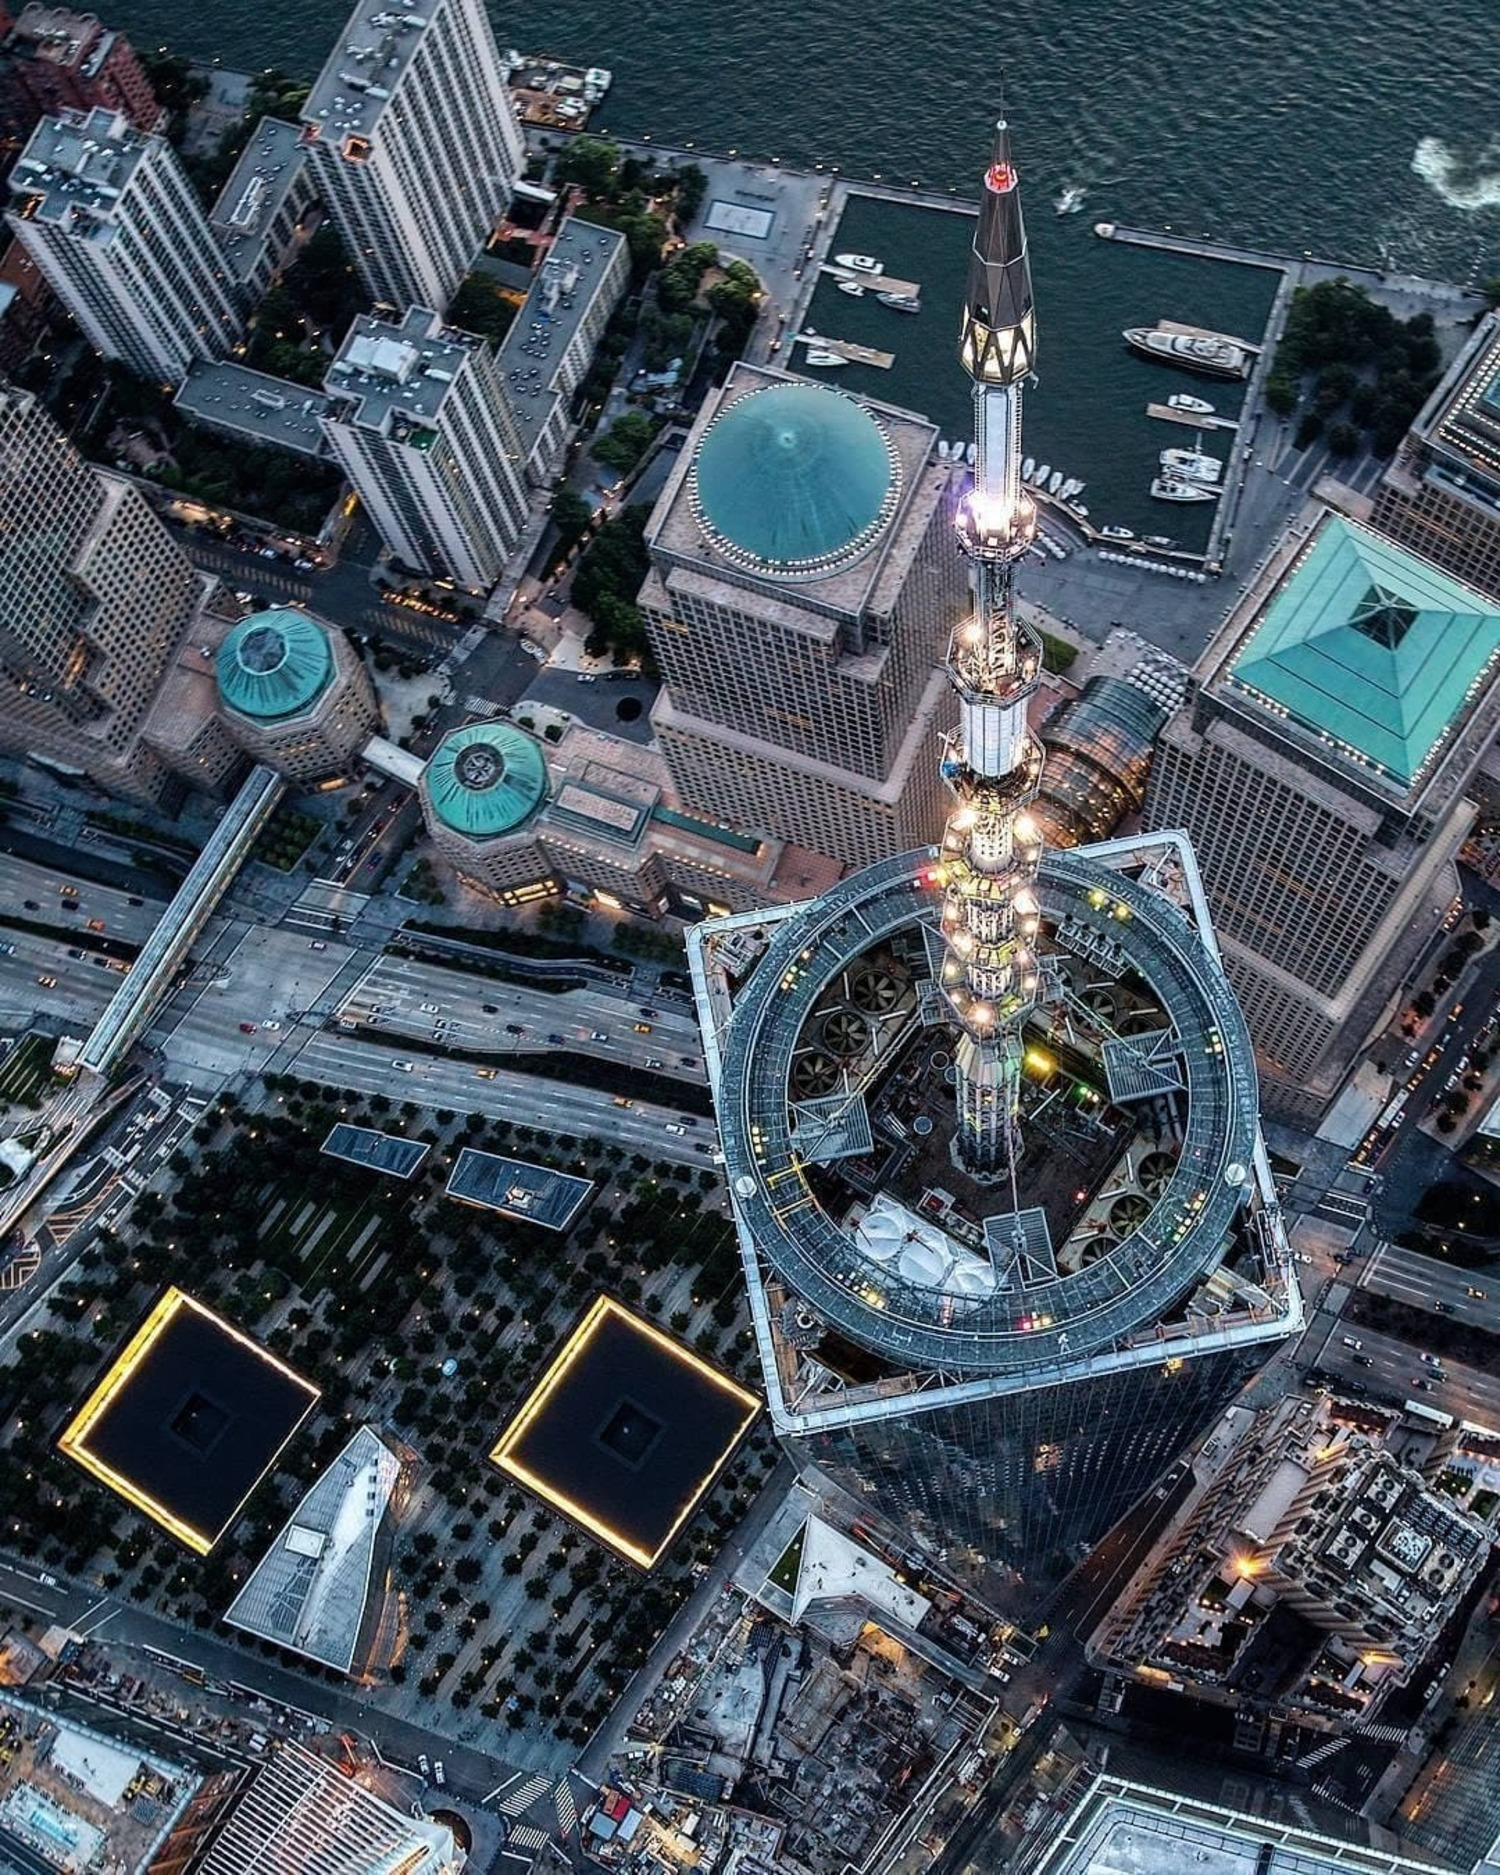 9/11 Memorial Plaza, Financial District, Manhattan